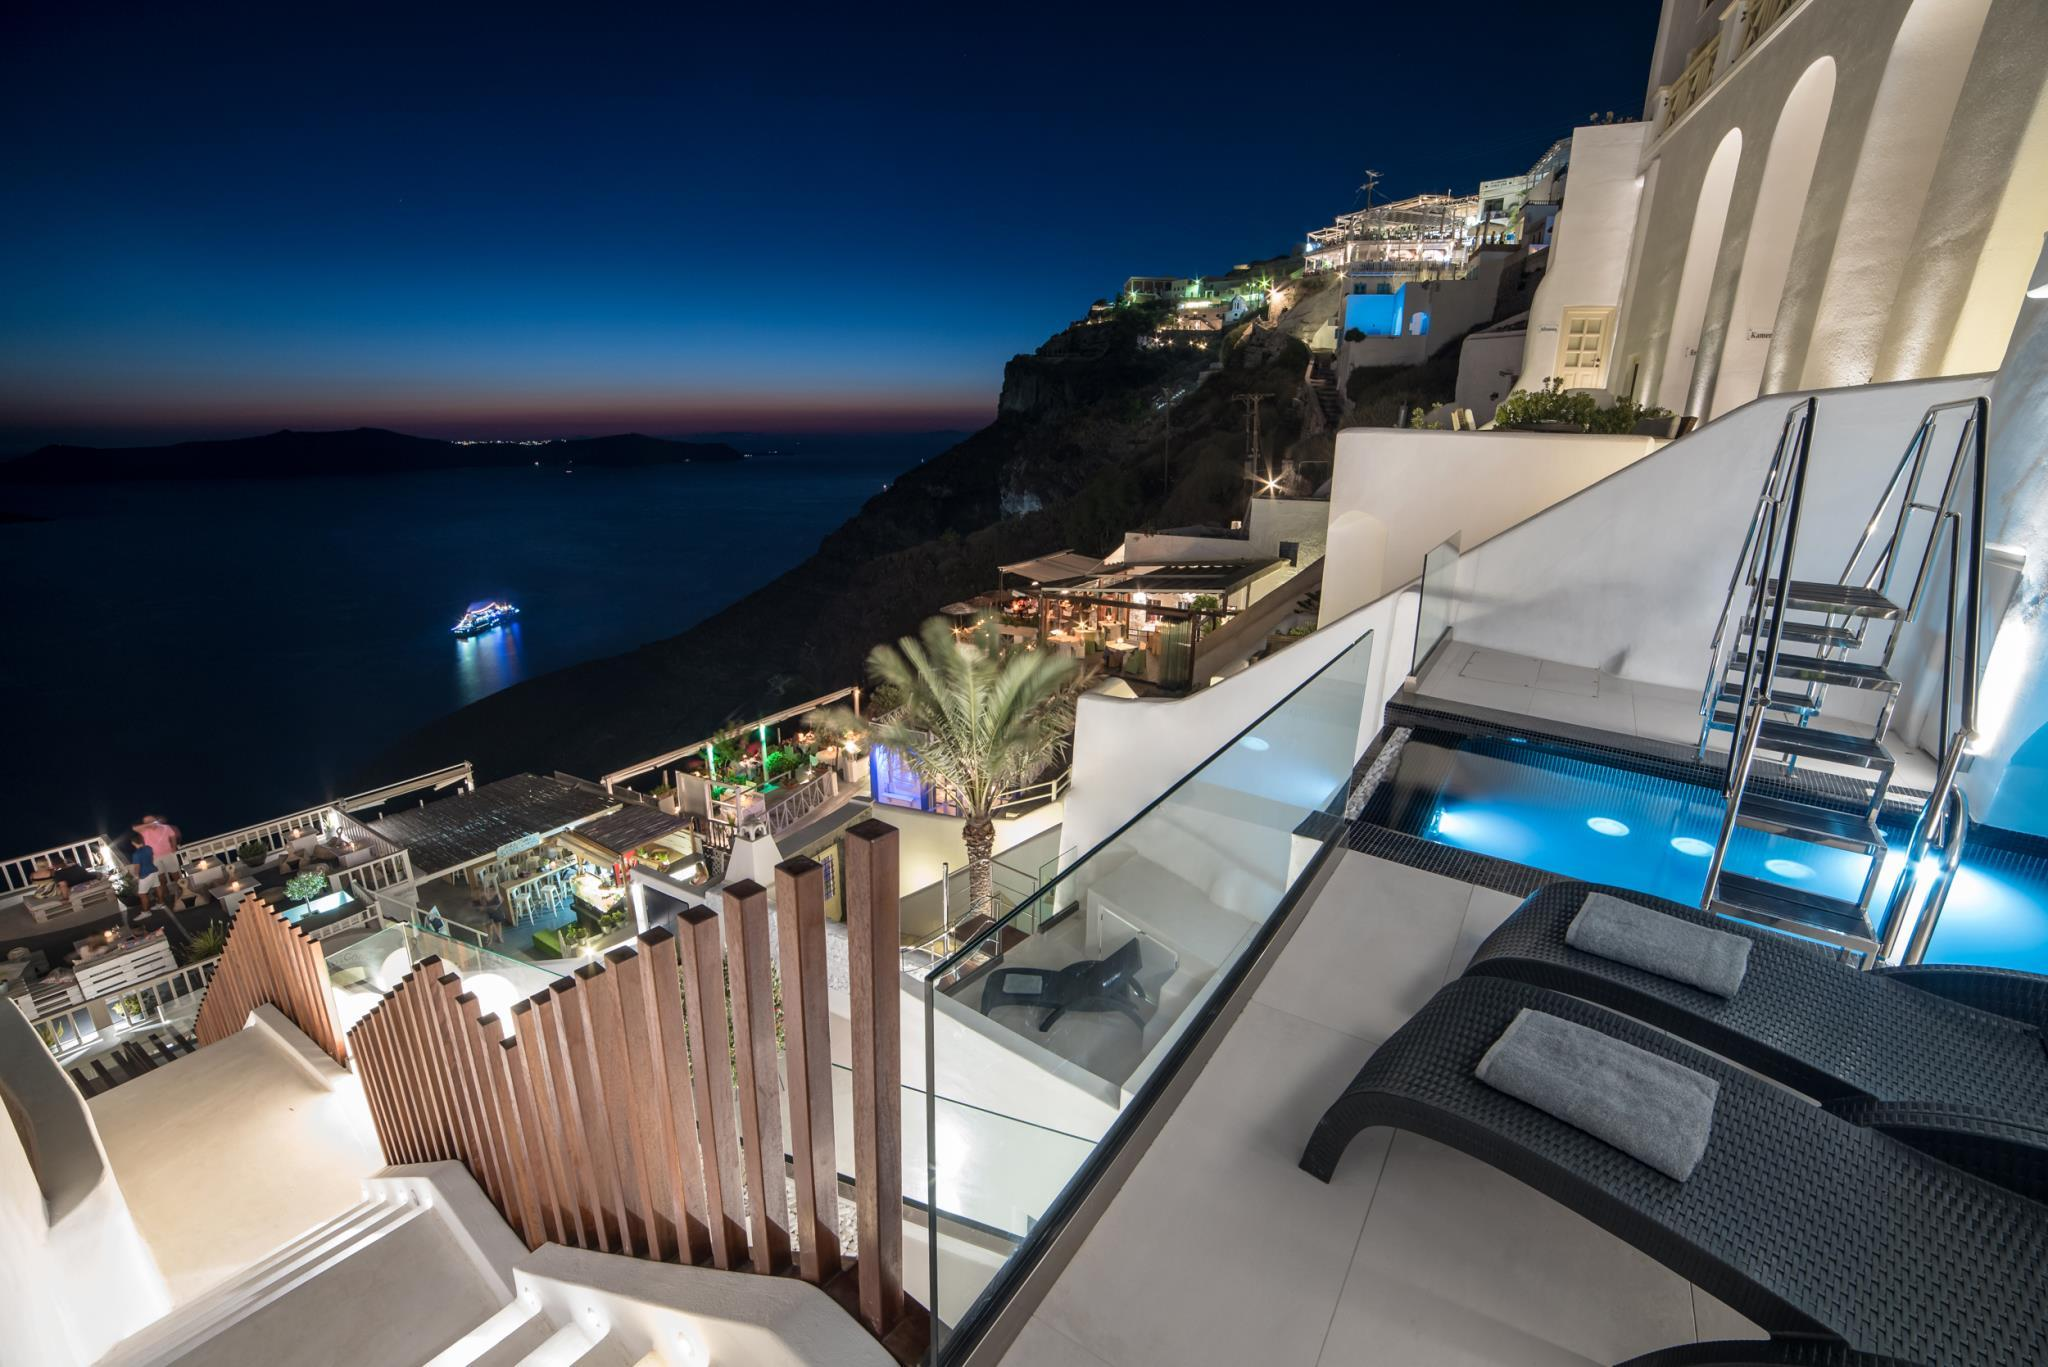 Day Dream Luxury Suites Santorini 5 Star Hotel In Santorini Greece